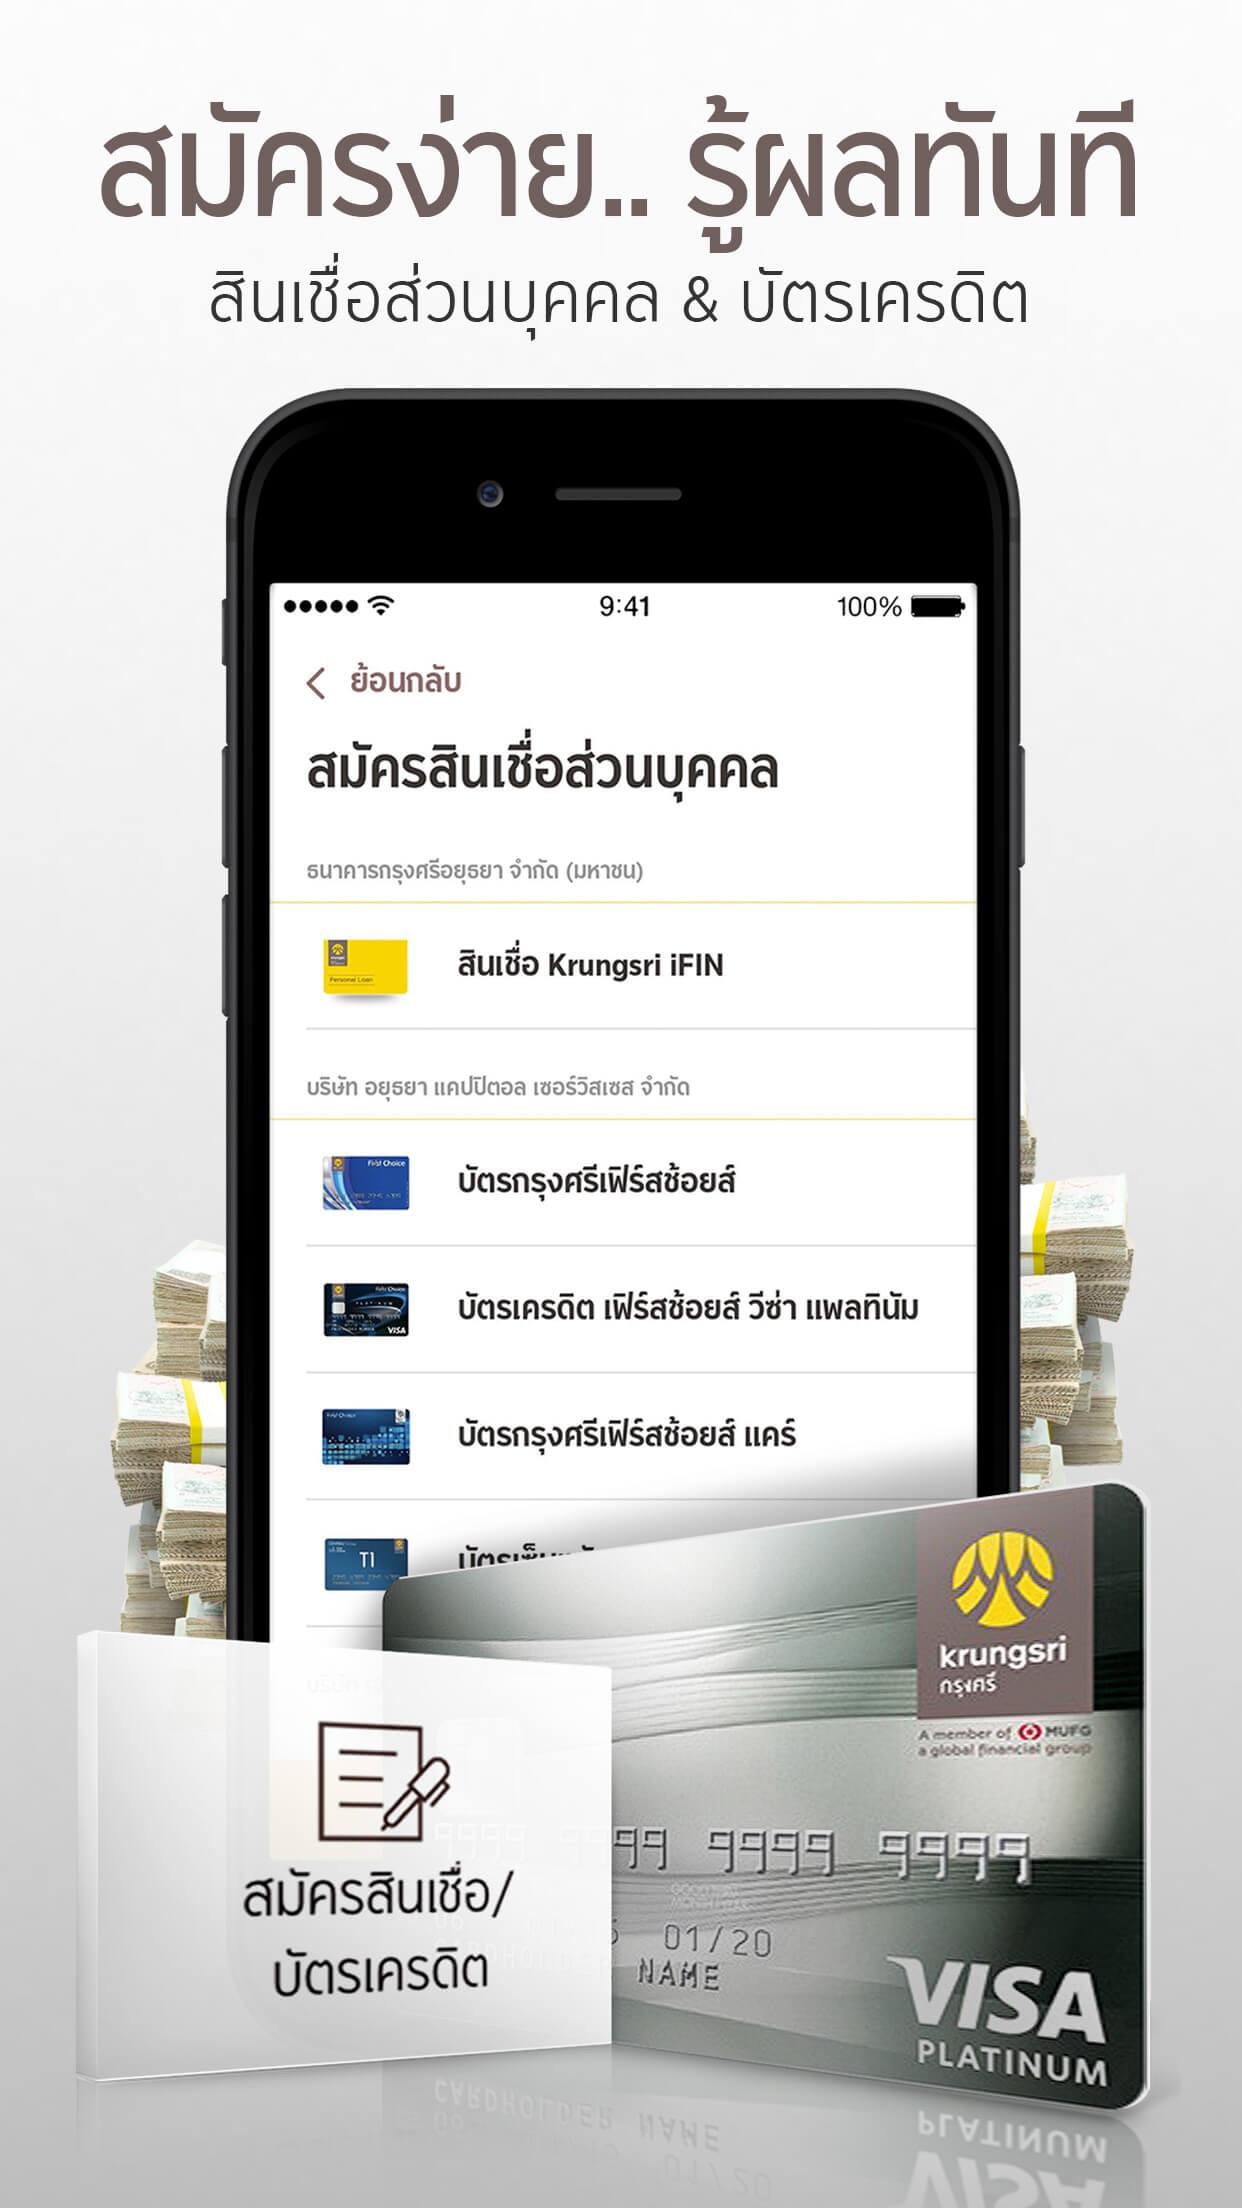 KMA-Krungsri Mobile App Screenshot